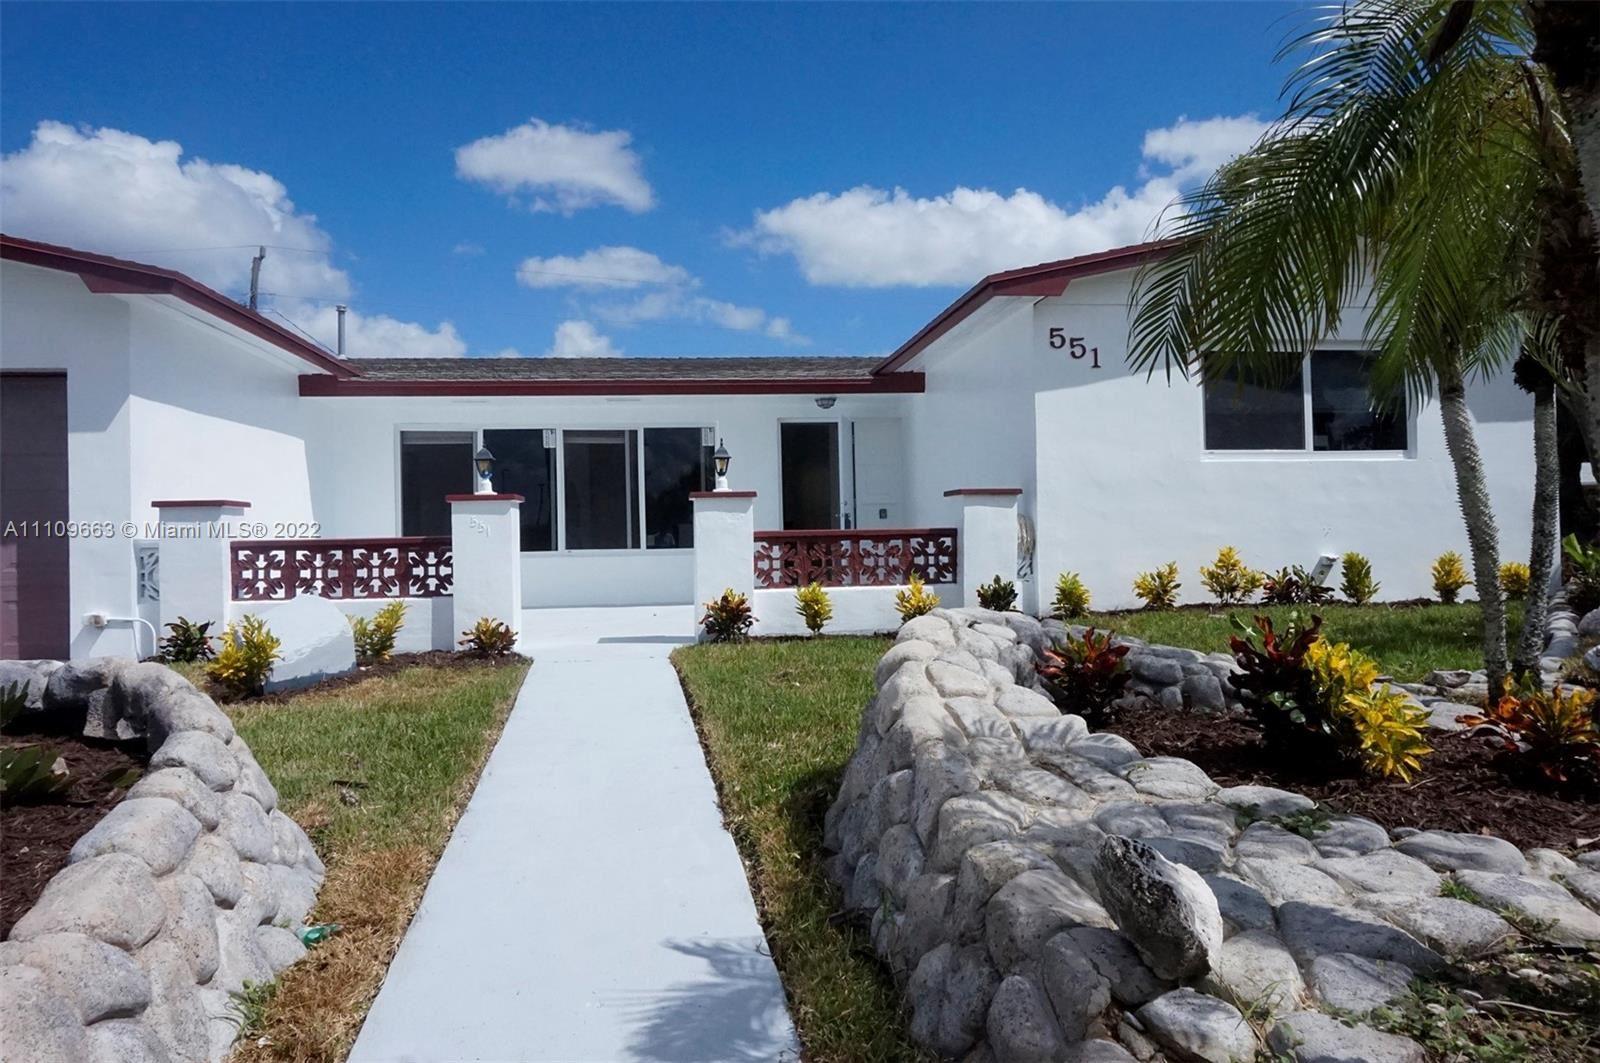 Photo of 551 SW 72nd Ave, Pembroke Pines, FL 33023 (MLS # A11109663)